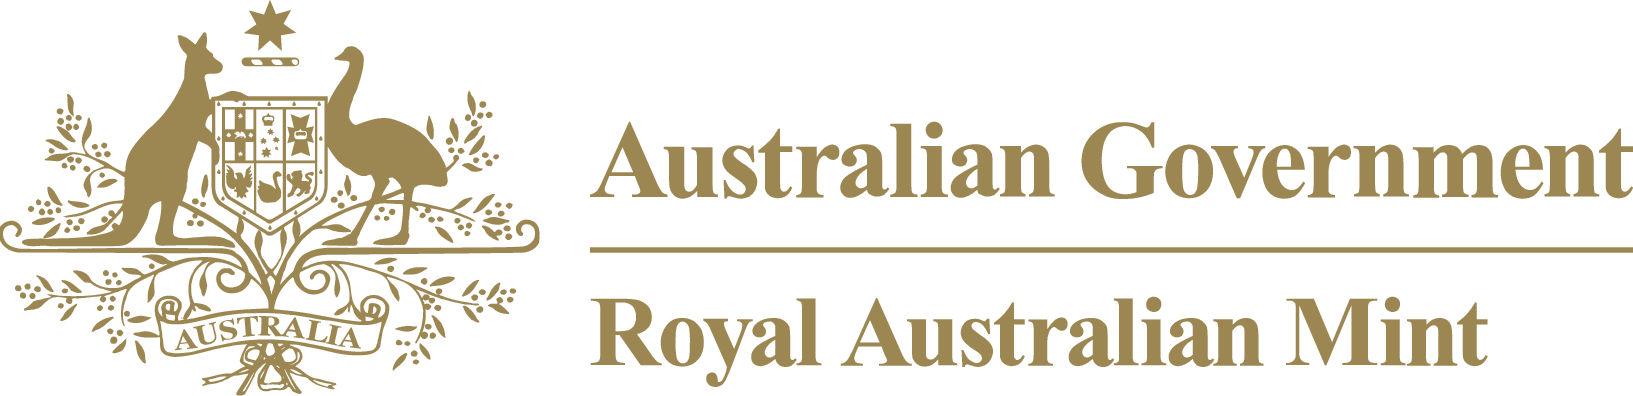 royal-australian-mint-logo